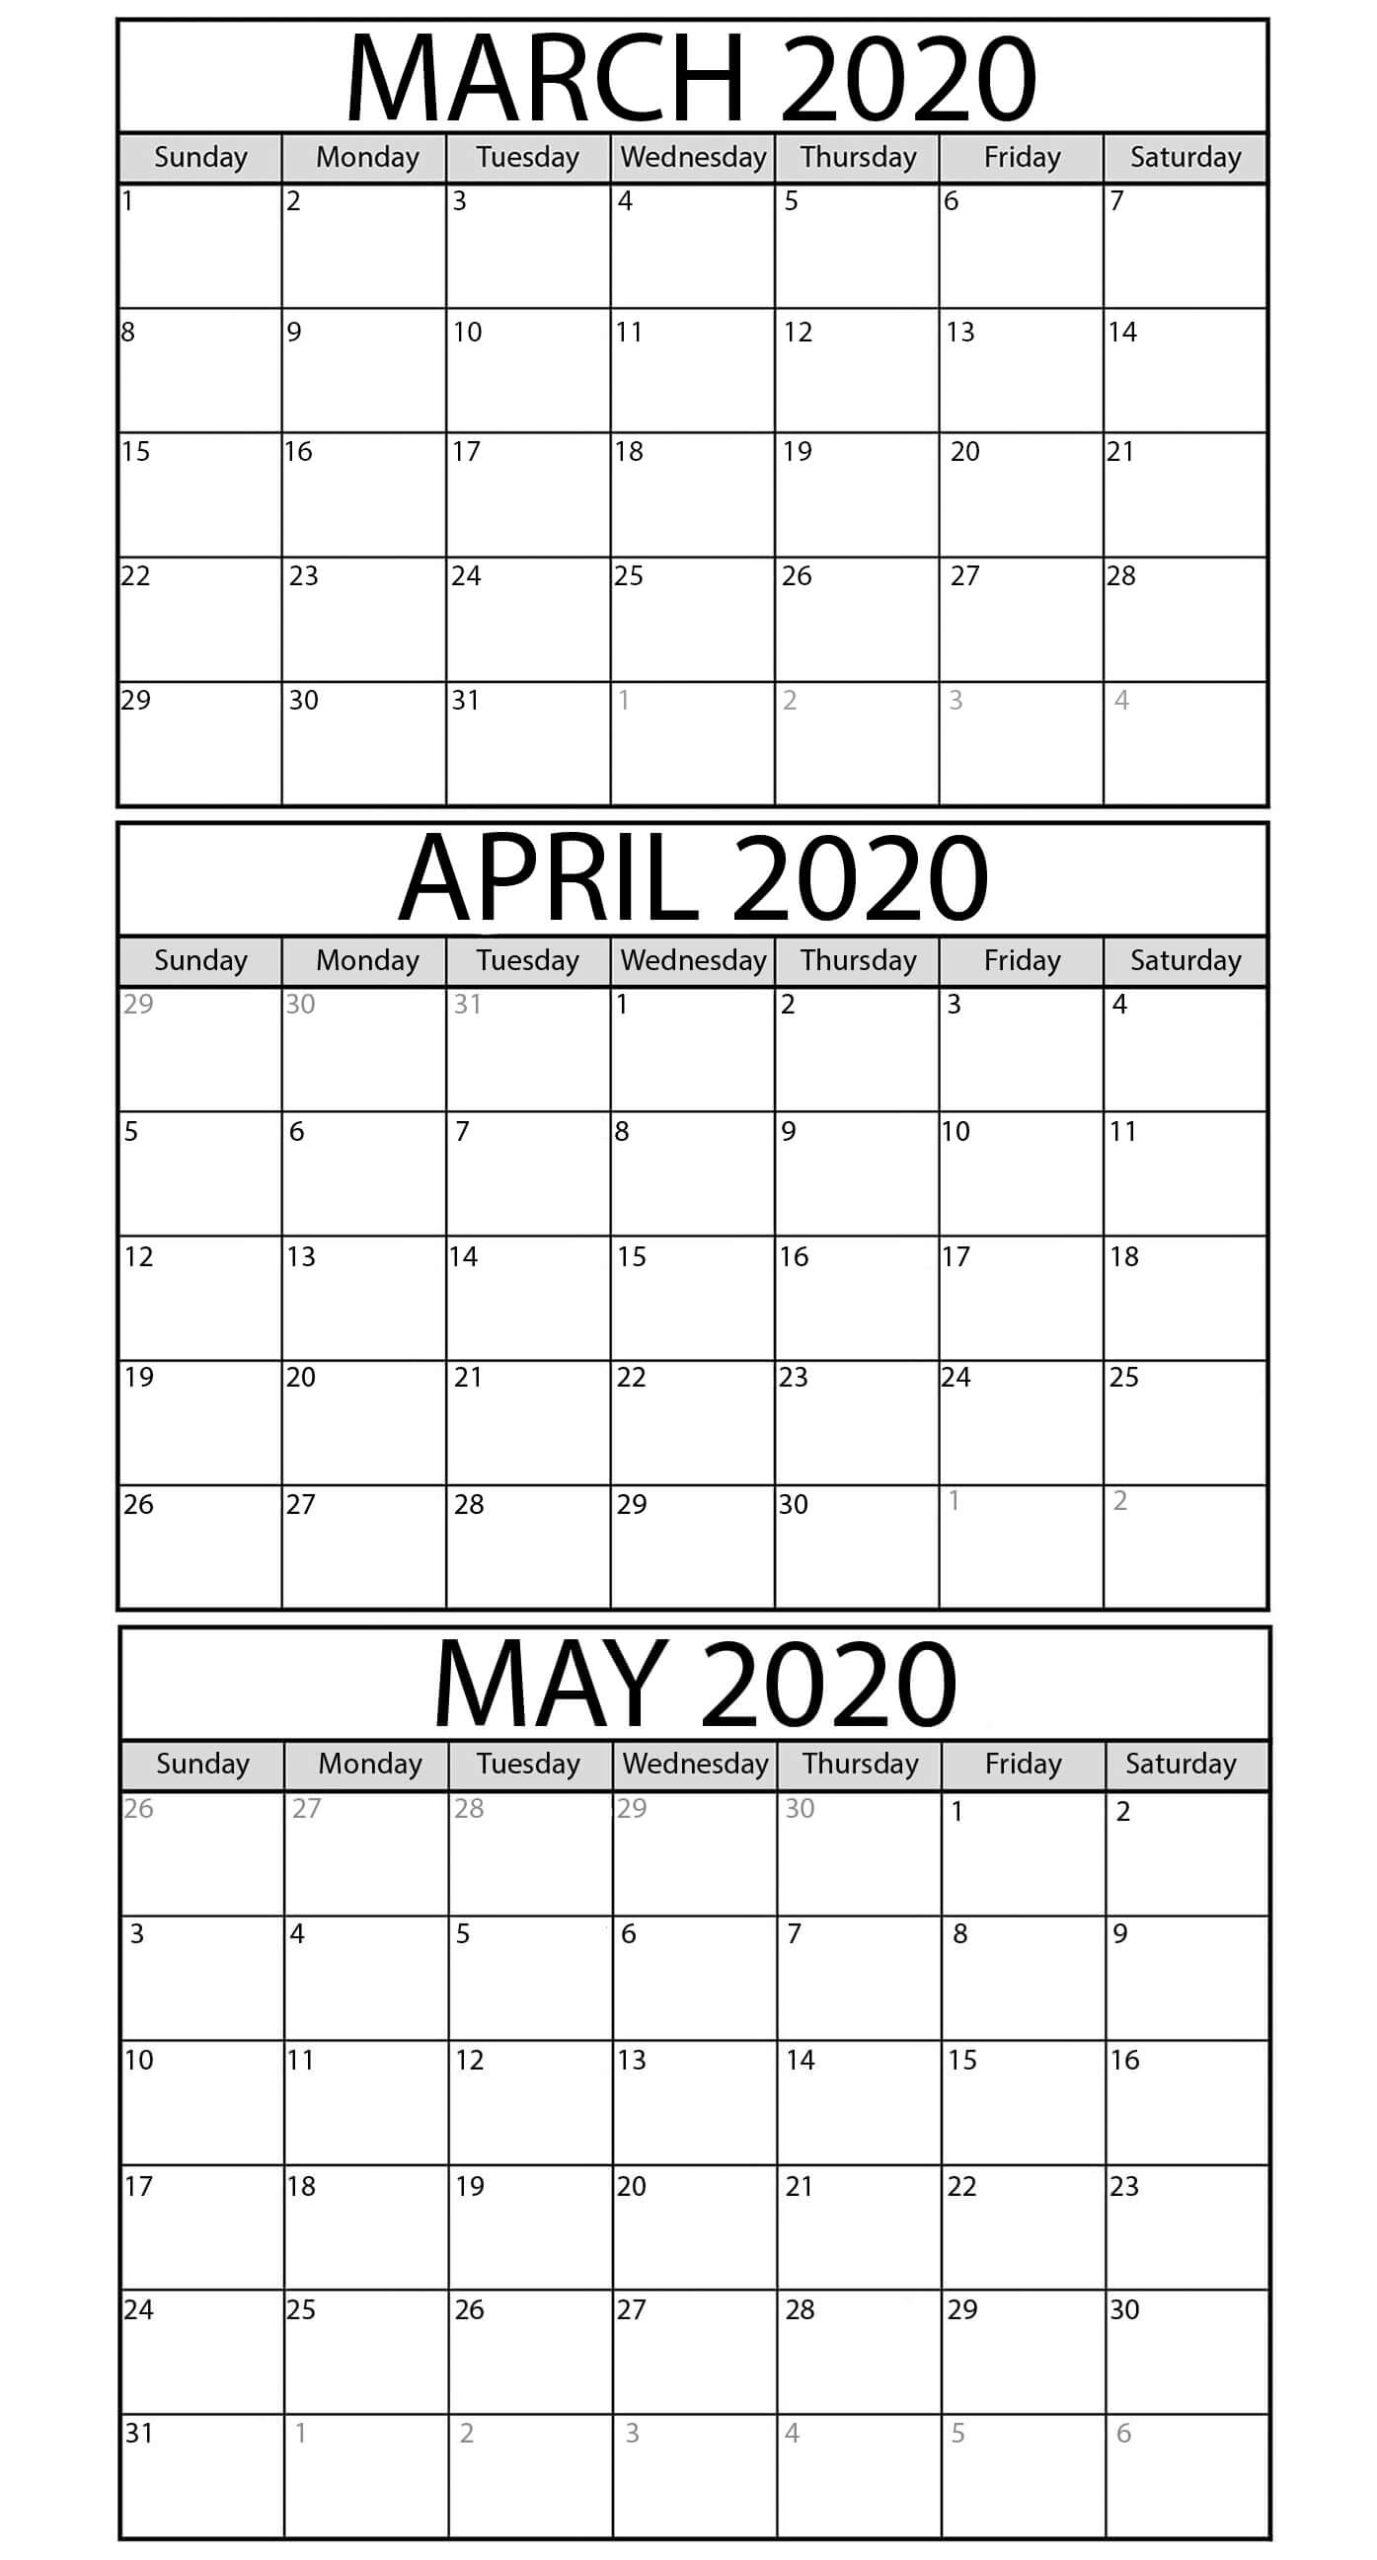 Printable March To May 2020 Calendar Templates  2019 regarding 3 Month Calendar Template